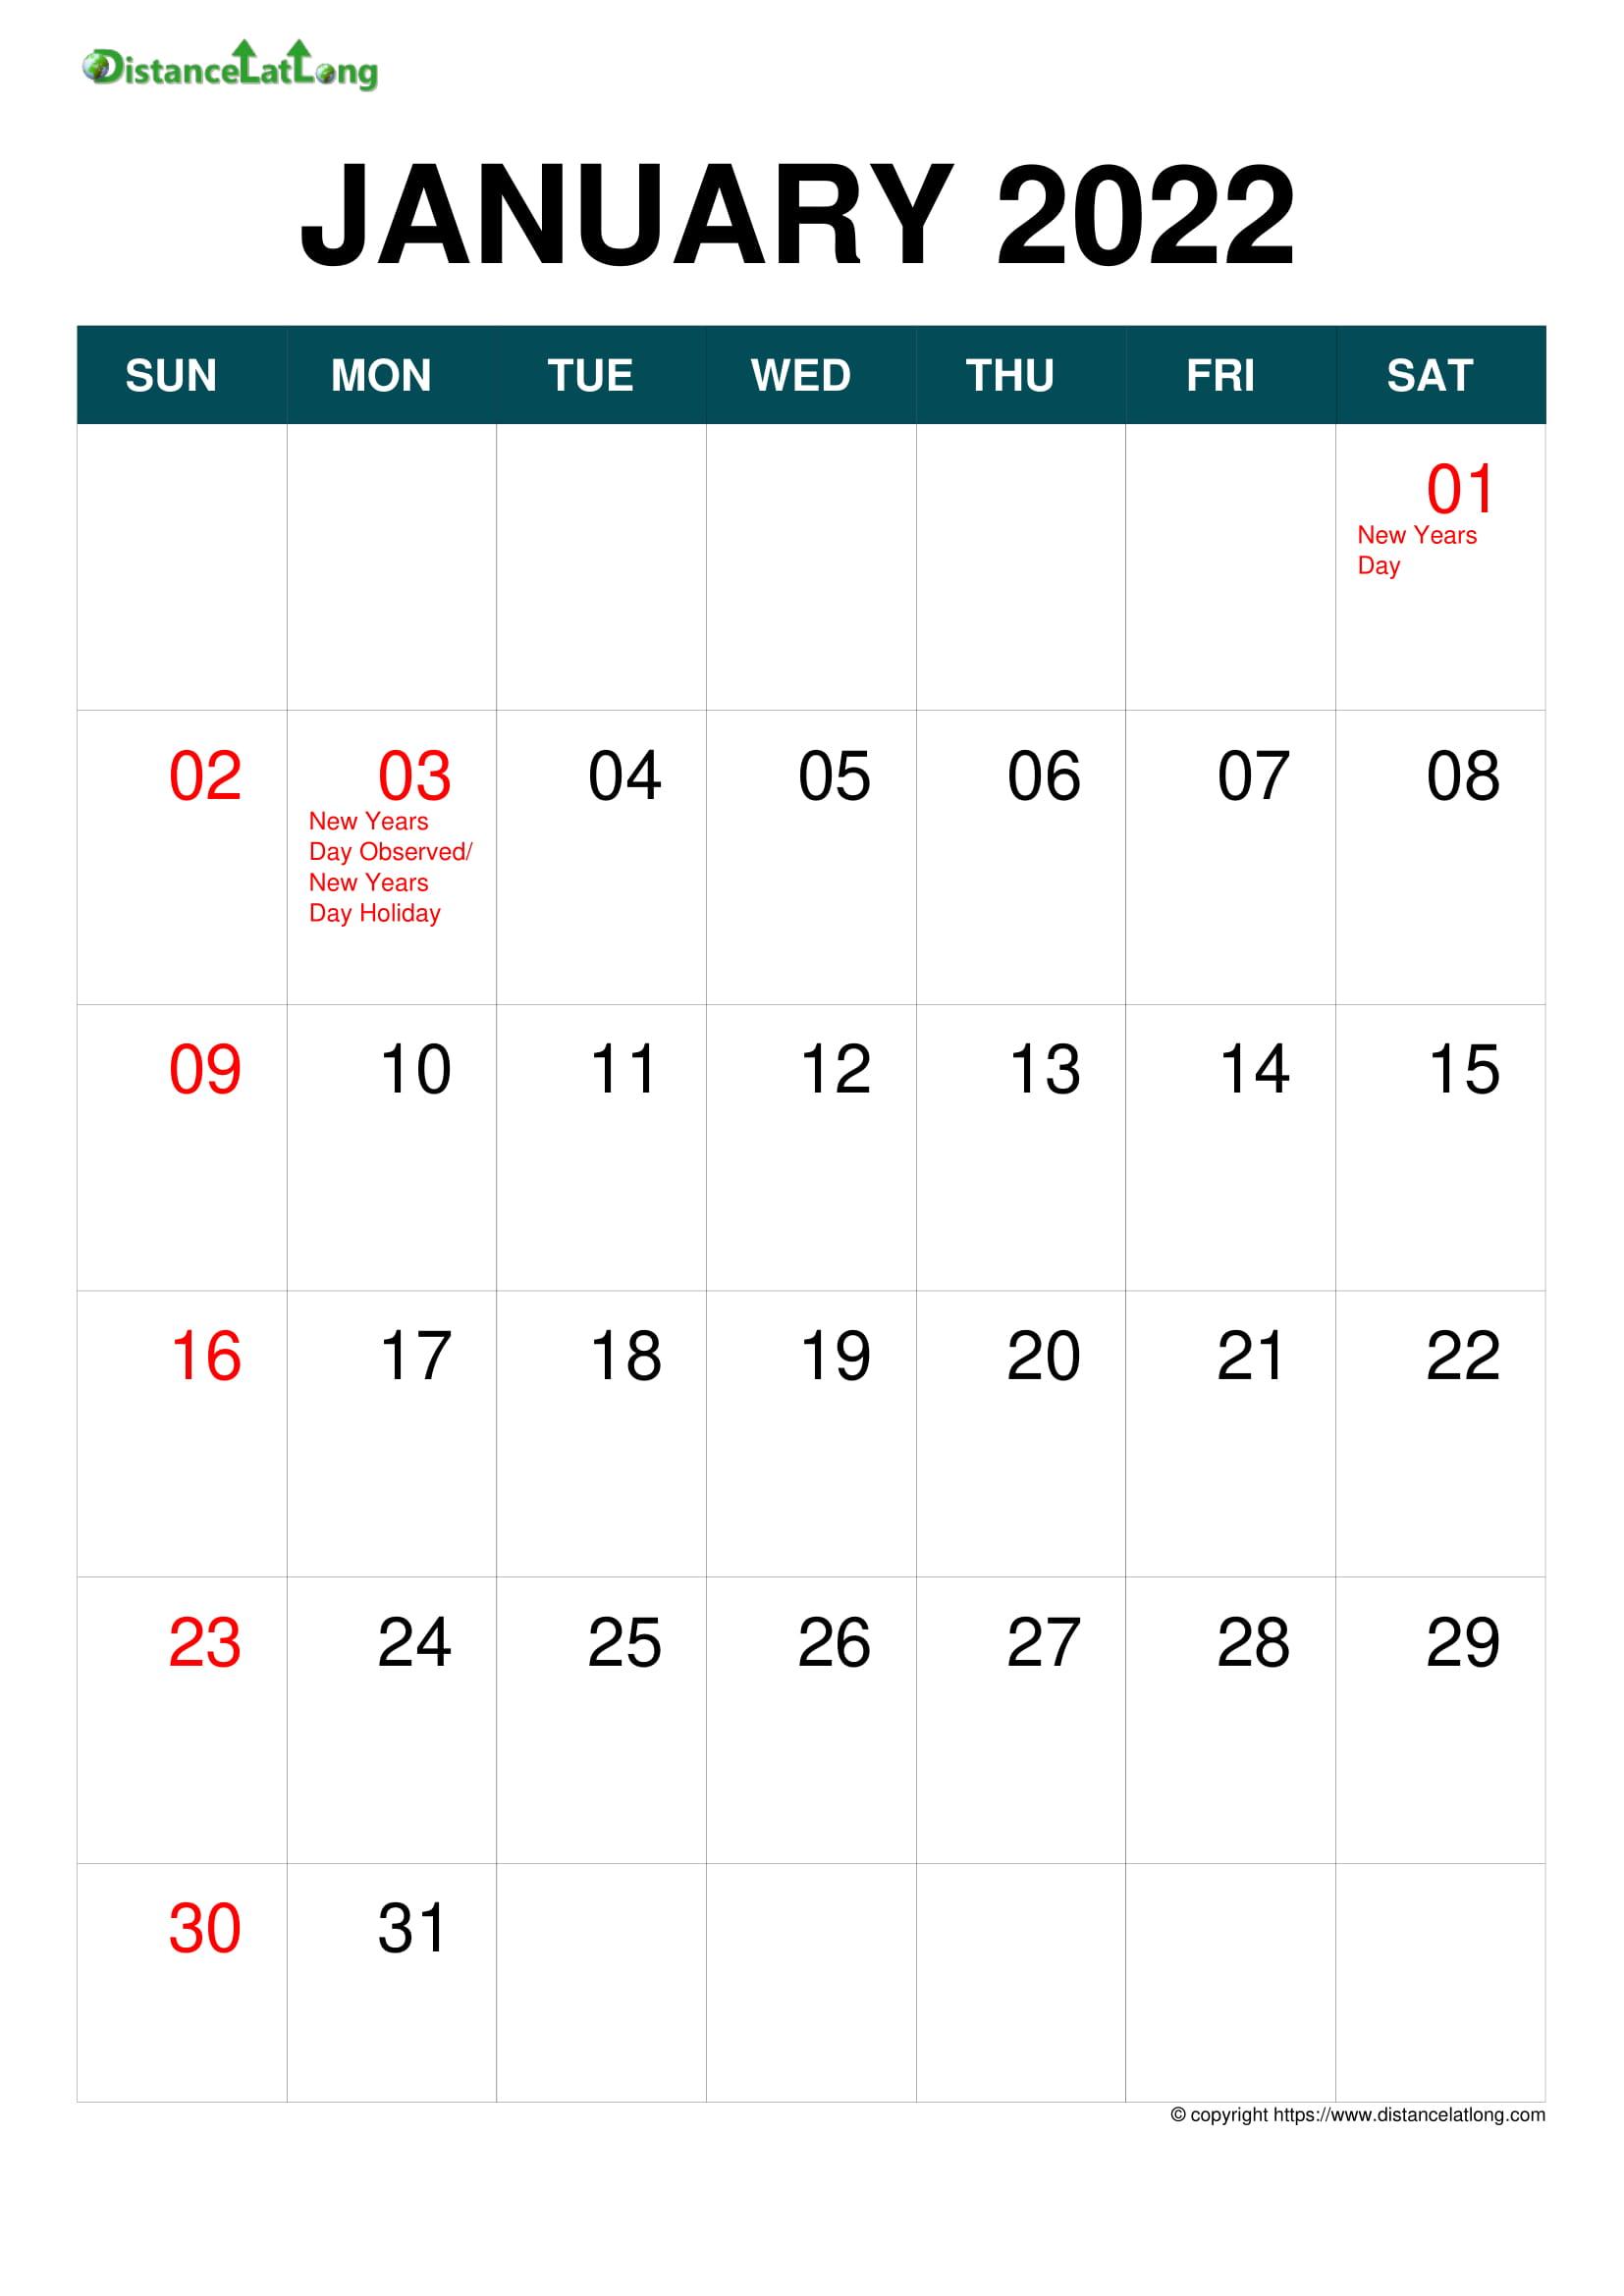 Holiday 2022 Calendar.2022 Holiday Calendar Portrait Orientation Free Printable Templates Free Download Distancelatlong Com